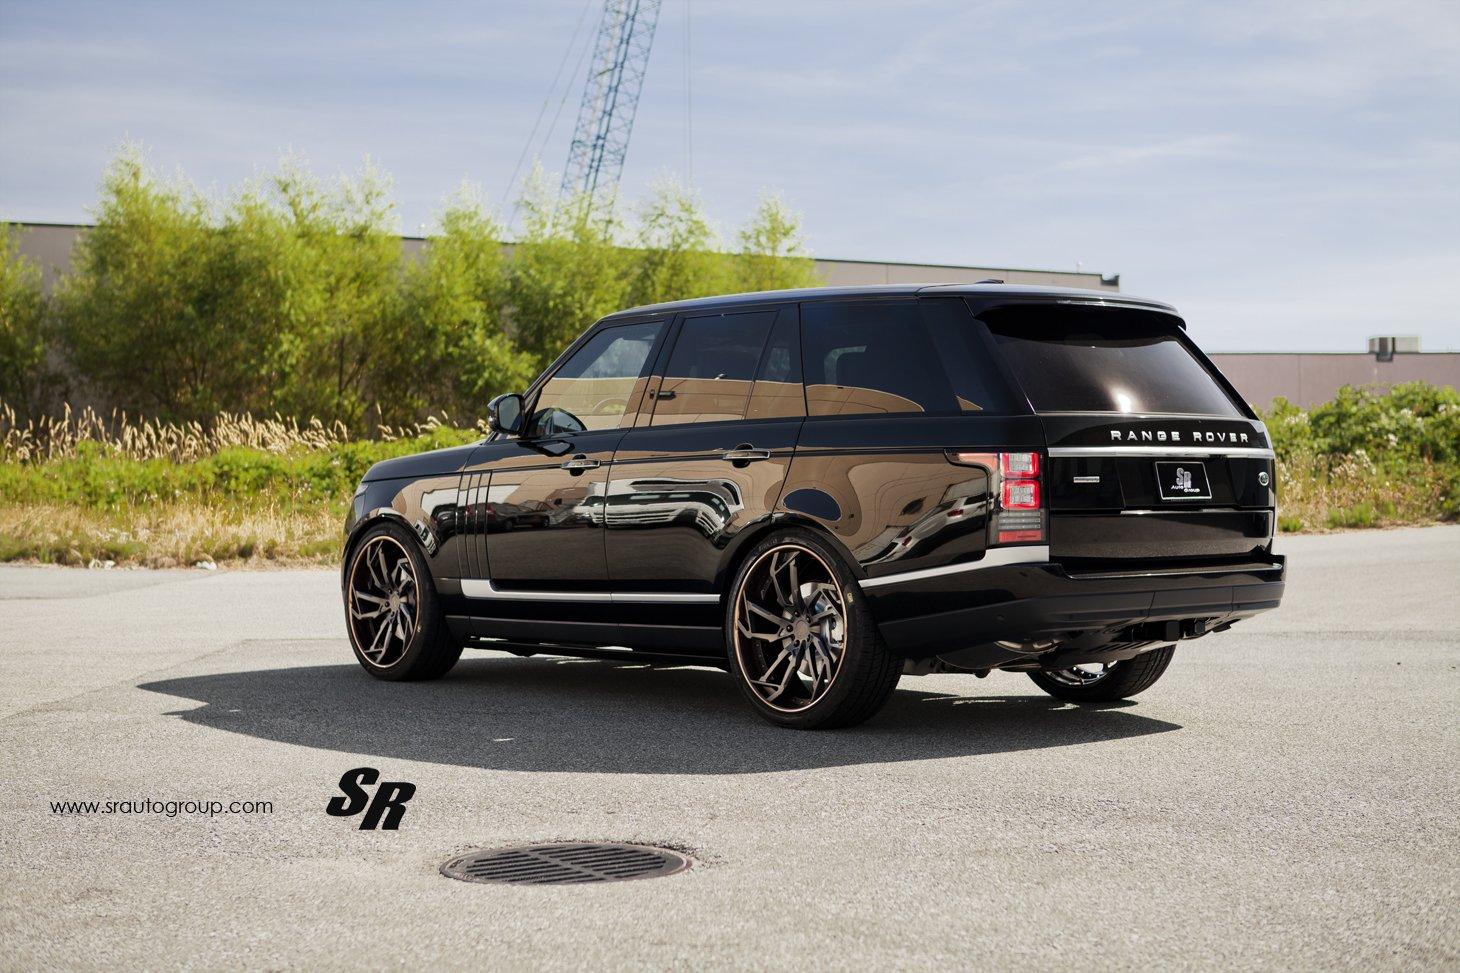 Range Rover Sport Black Rims >> Range Rover sport black pur wheels tuning cars wallpaper   1460x973   718723   WallpaperUP